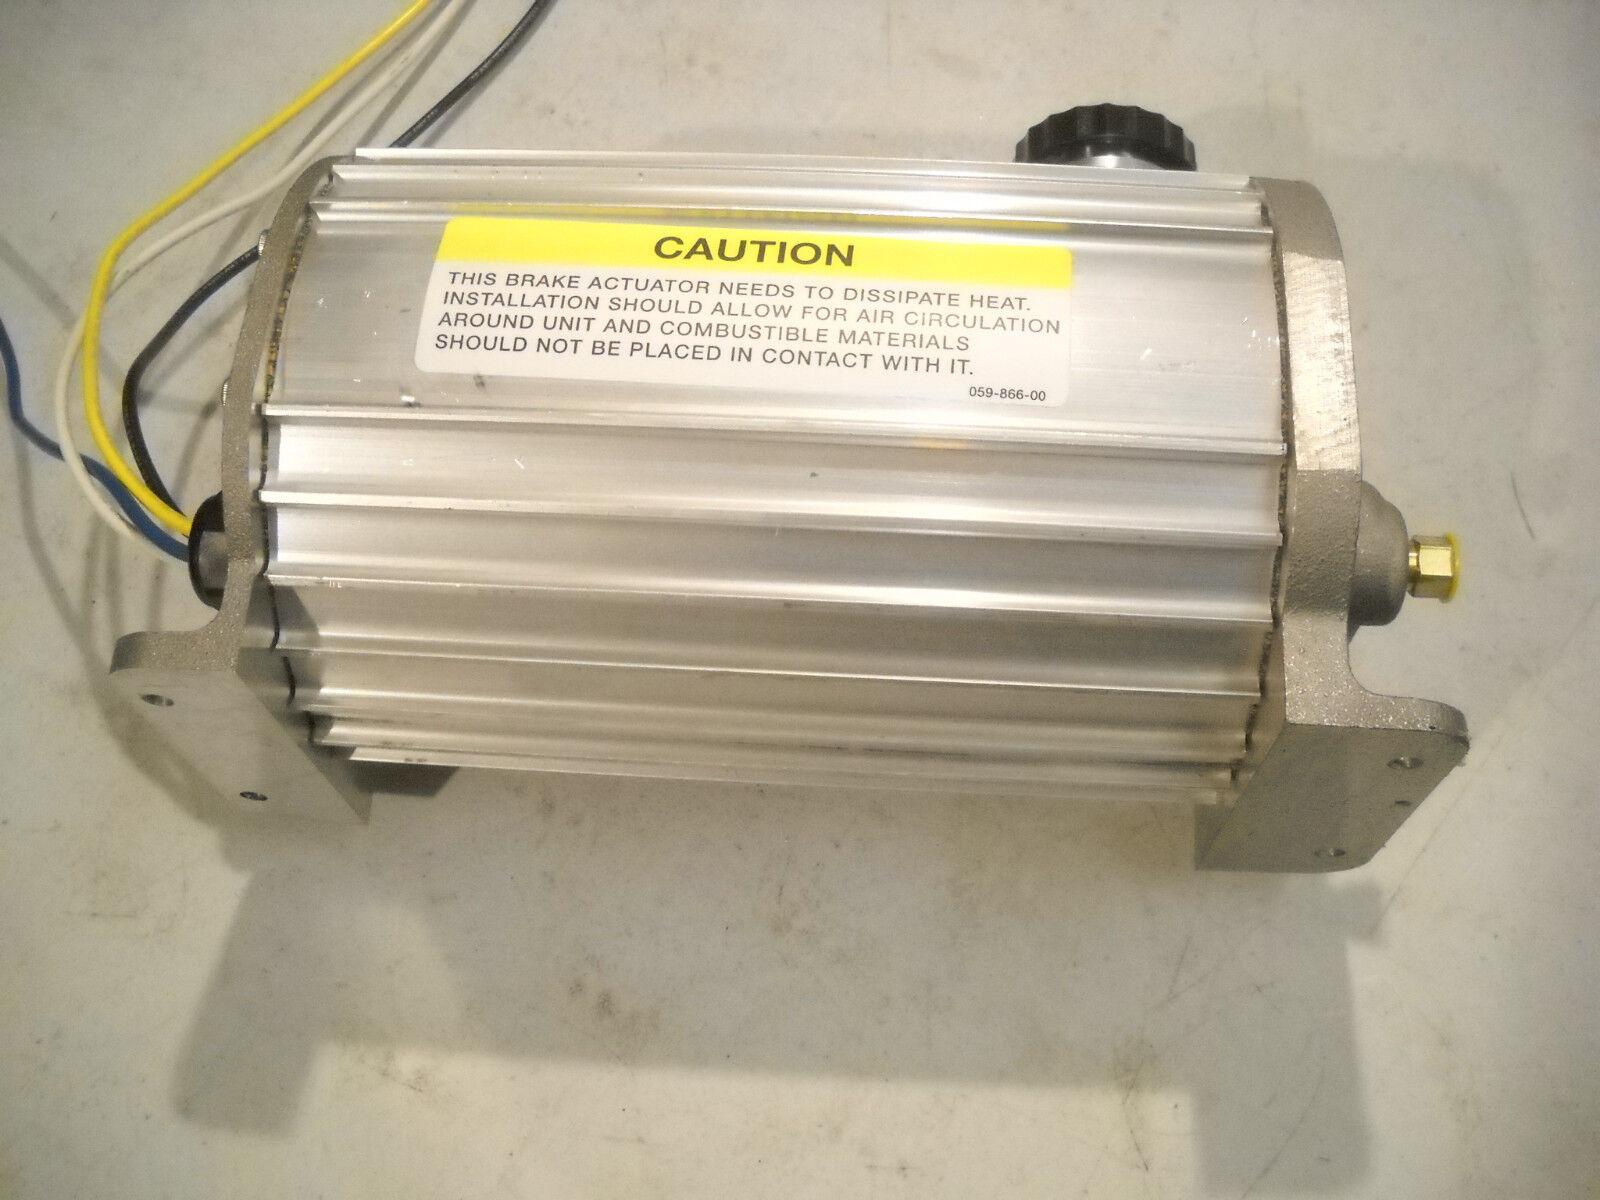 Dexter Electric Over Hydraulic Drum Brake Actuator 1000 Psi Pump Wiring Diagram Trailer Axle Ebay